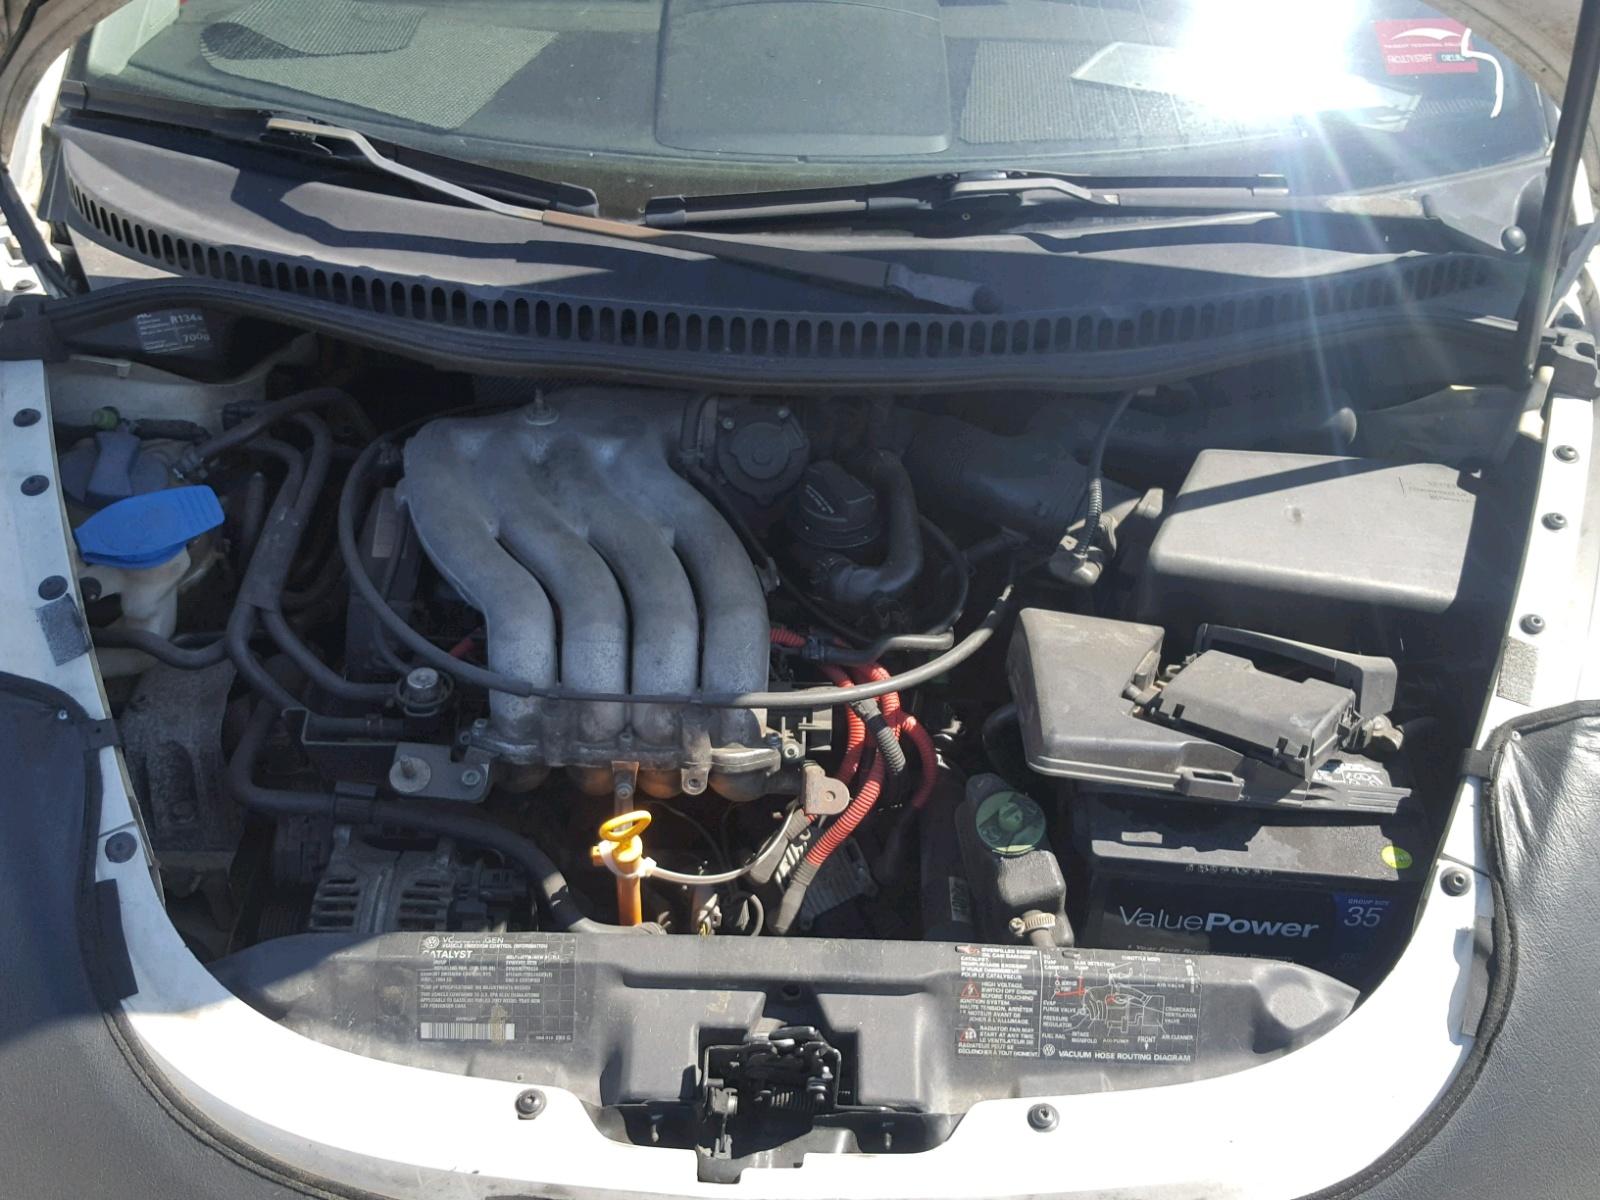 3vwca21c5xm414877 1999 White Volkswagen New Beetle On Sale In Sc 1936 Engine Diagram 20l Inside View